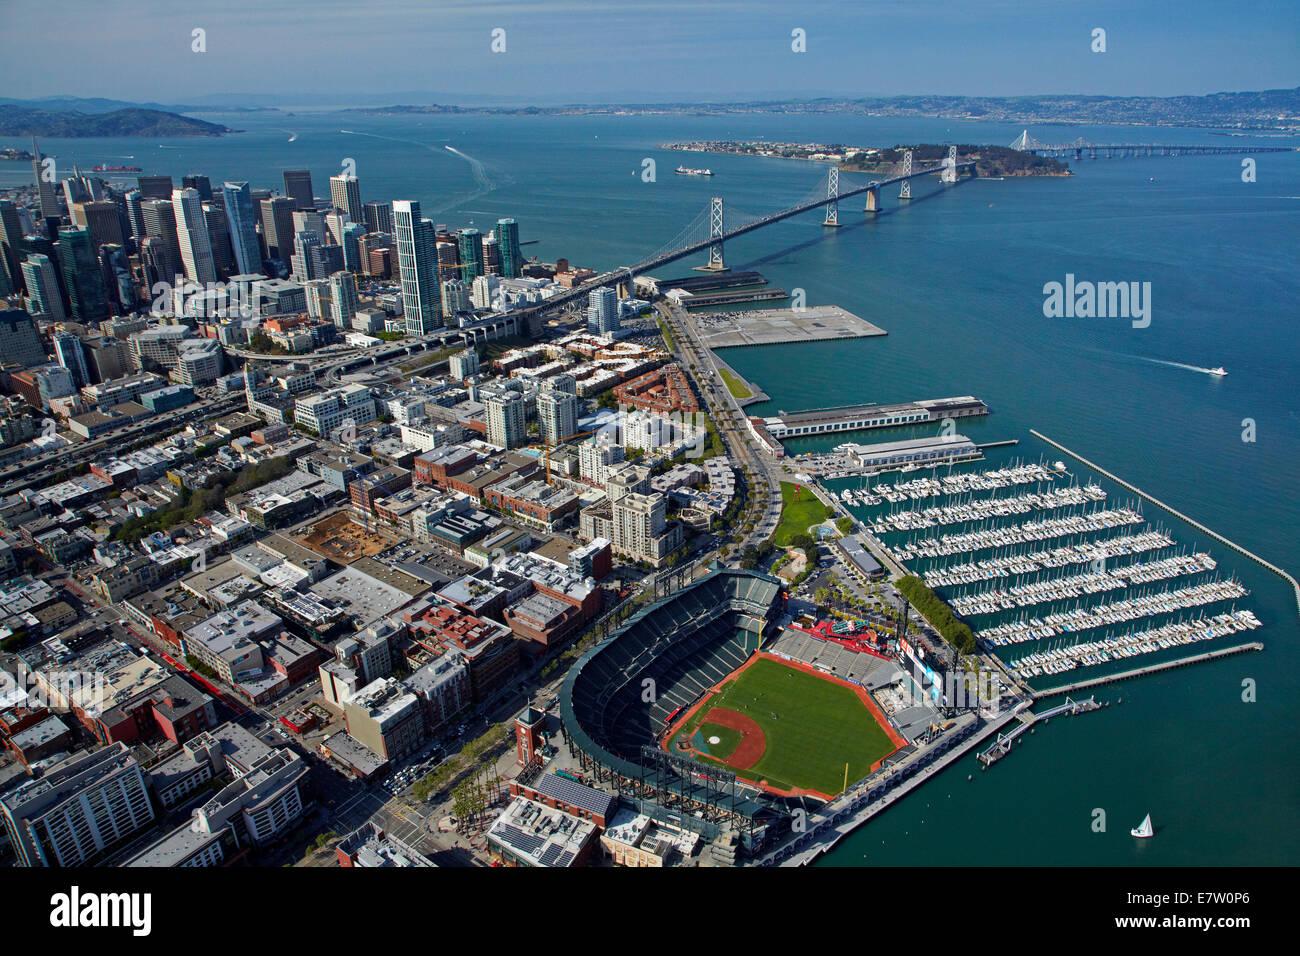 AT&T Park / Giants Ballpark, South Beach Marina, downtown San Stock